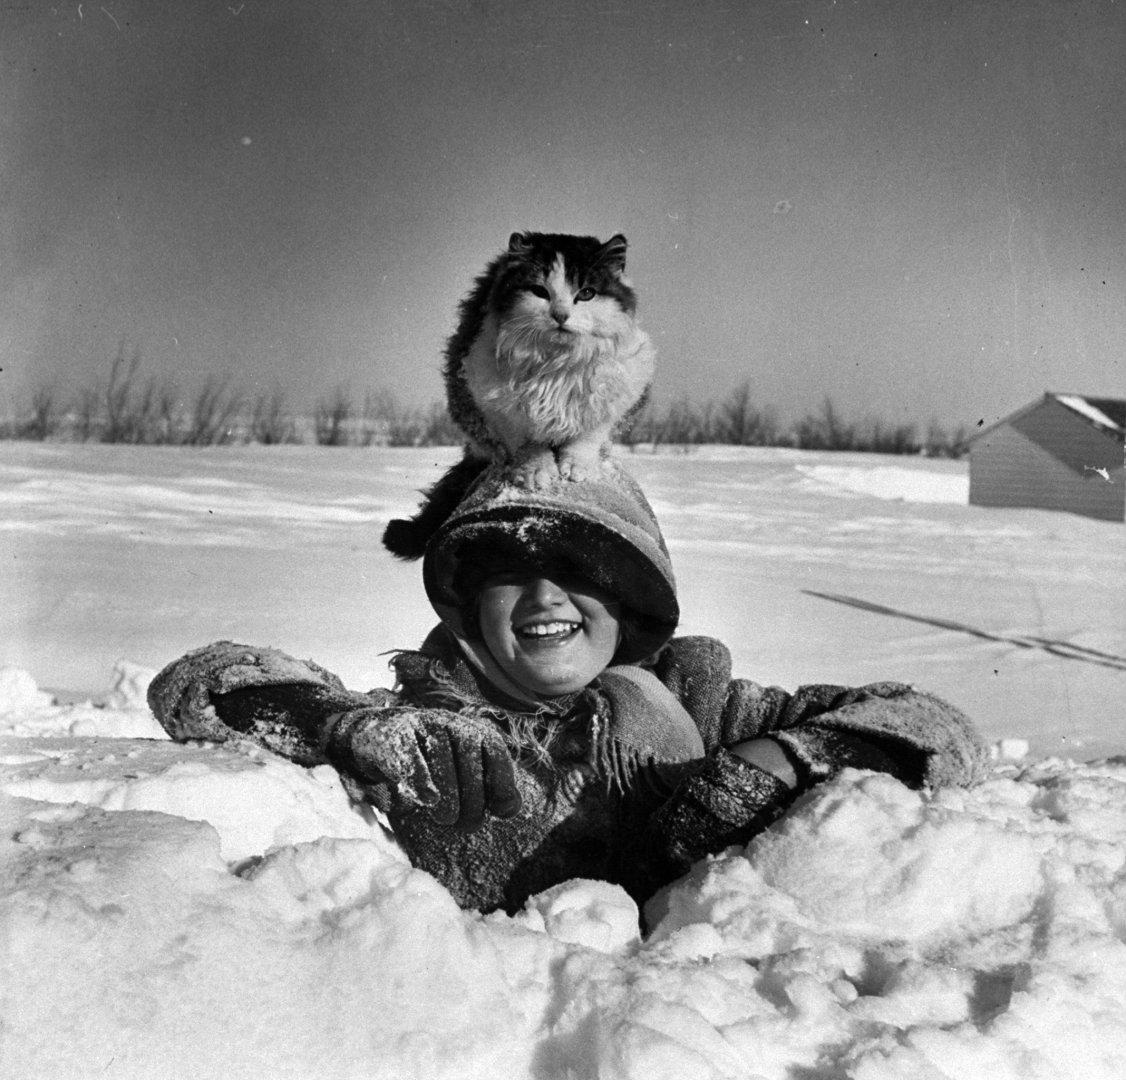 10-летняя Шэрон Адамс со своим котом, 1952 год